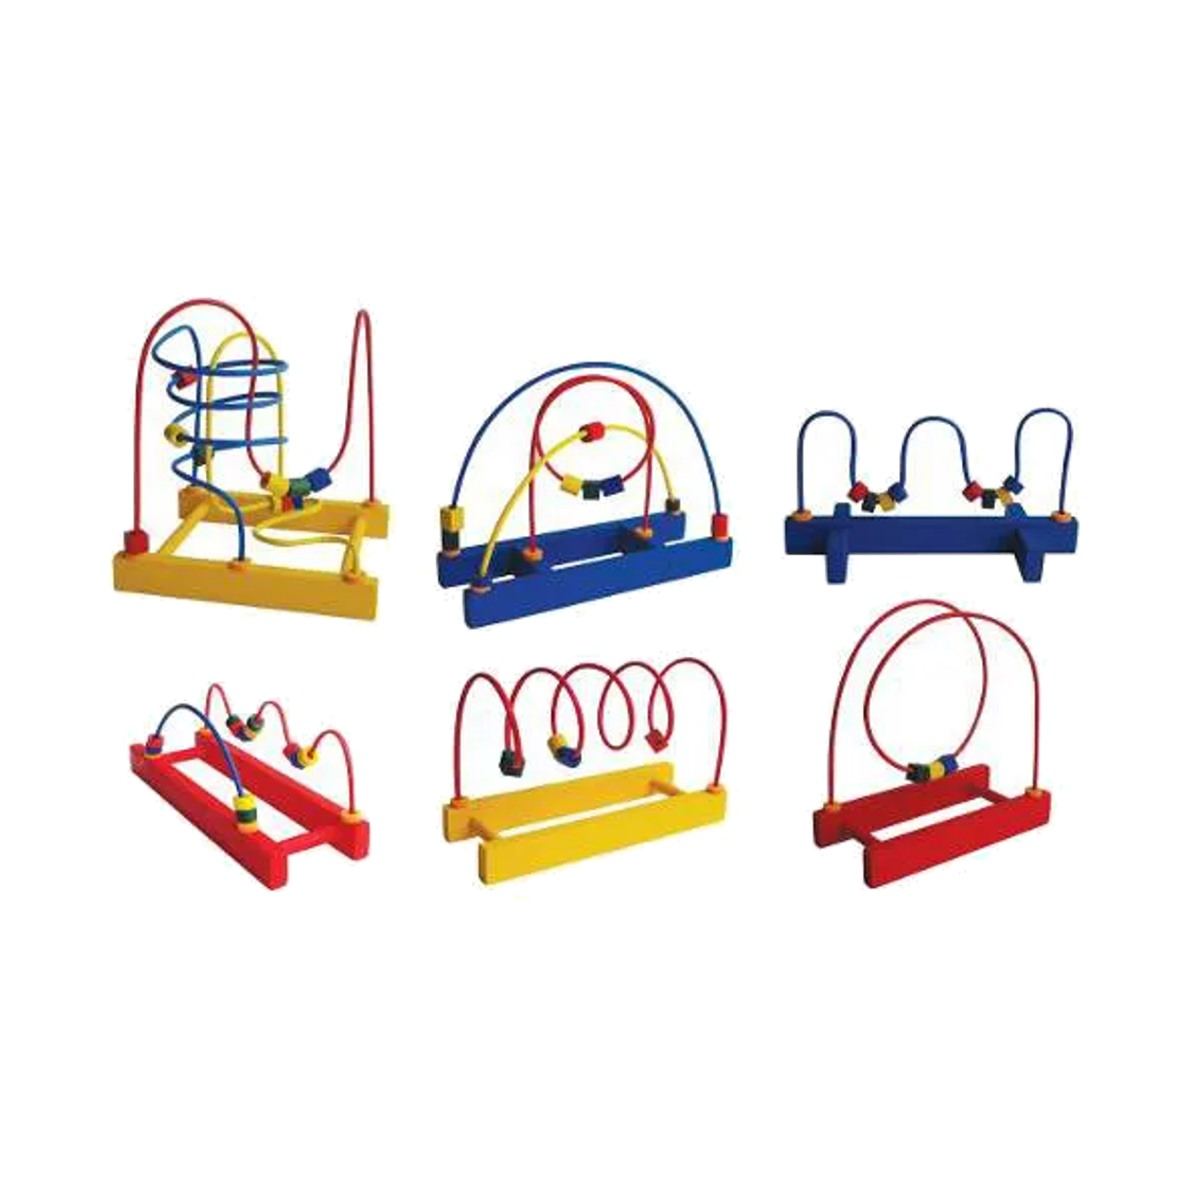 Brinquedo Educativos Conjunto de Aramados 6 Peças